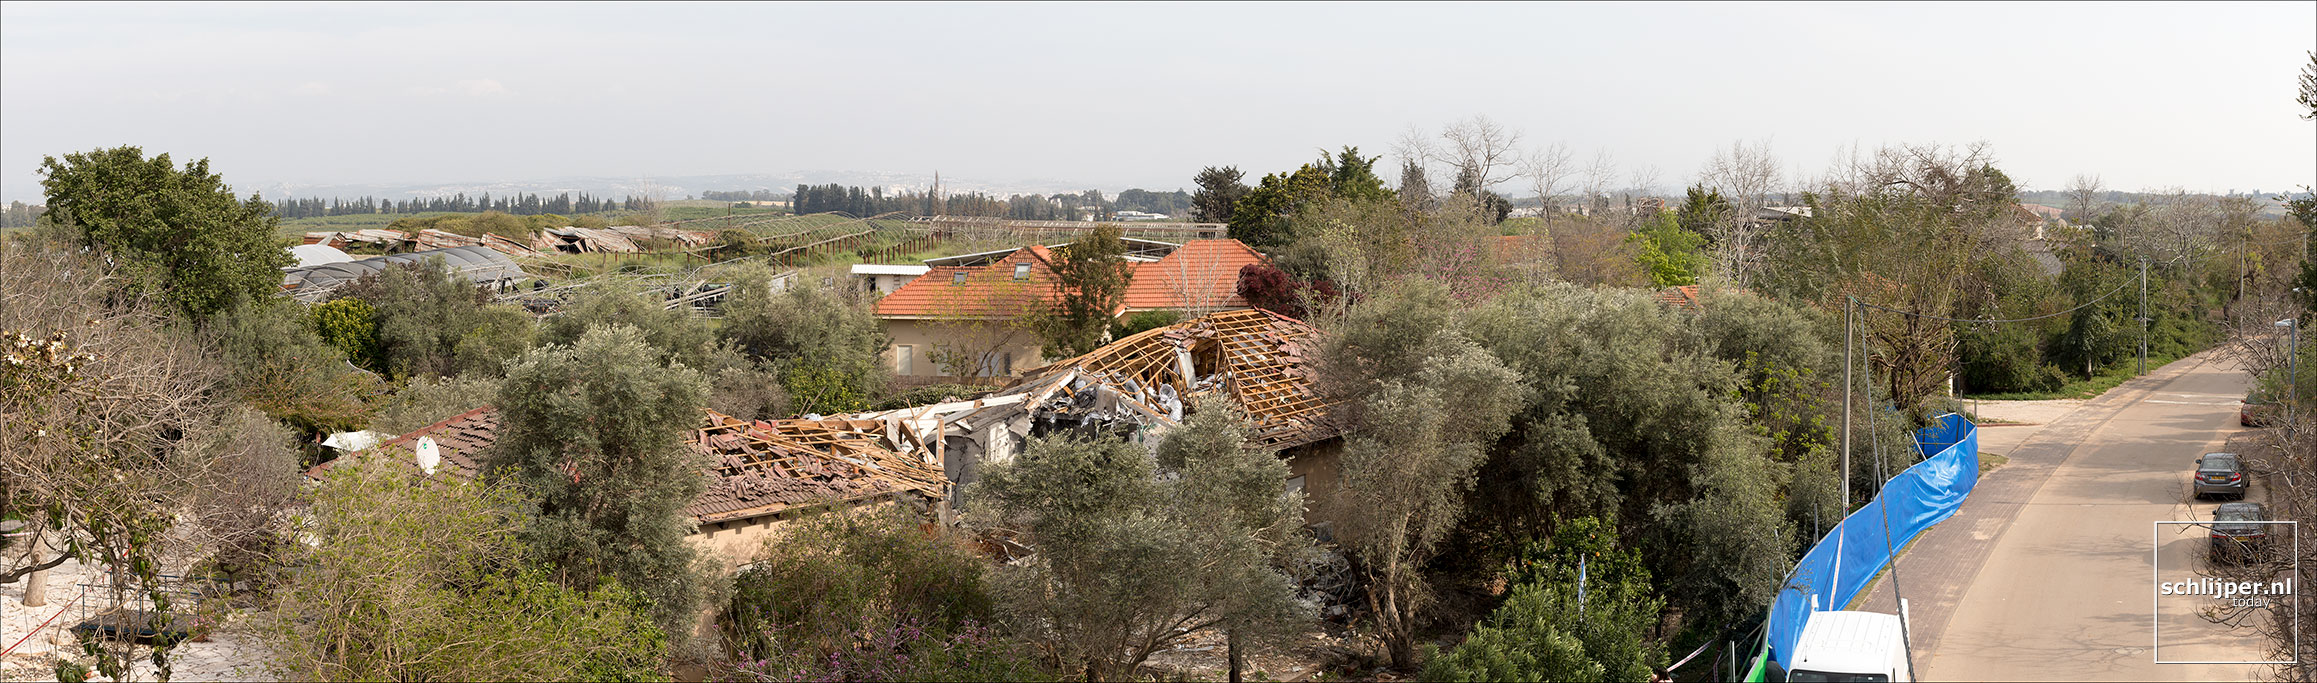 Israel, Mishmerret, 28 maart 2019